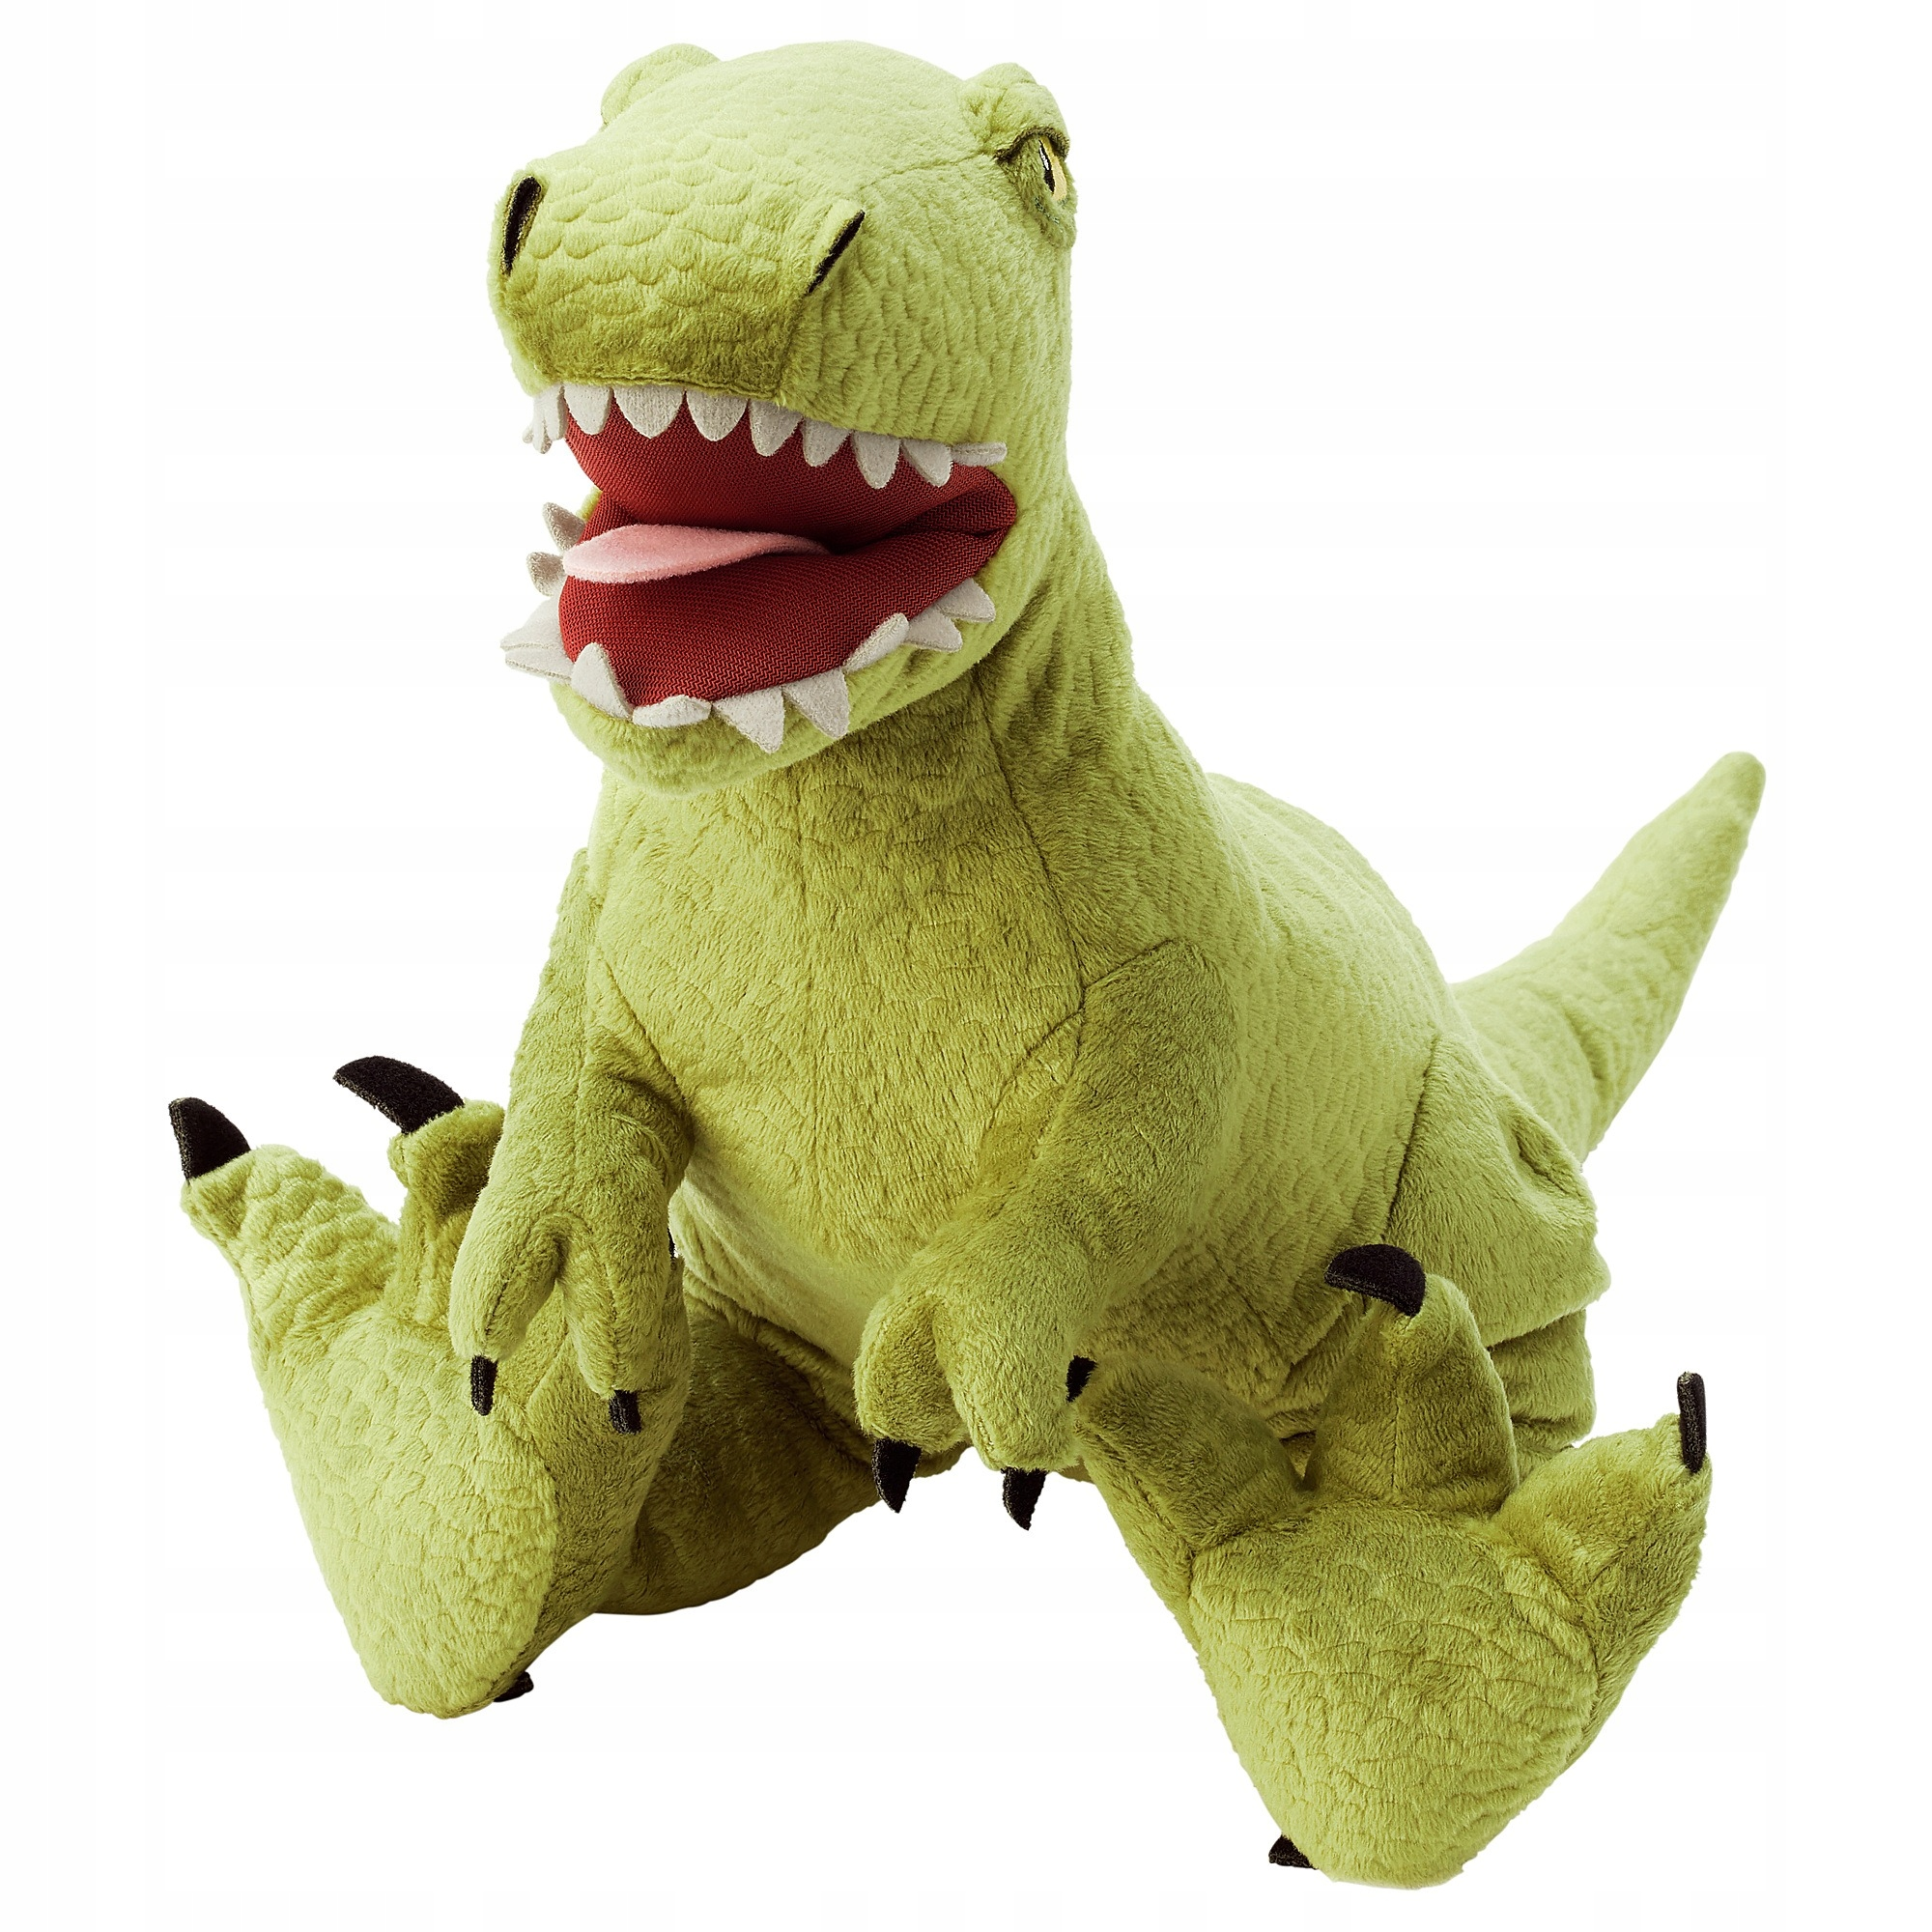 Plyšová hračka dinosaura IKEA JATTELIK Tyrannosaurus, 44 cm